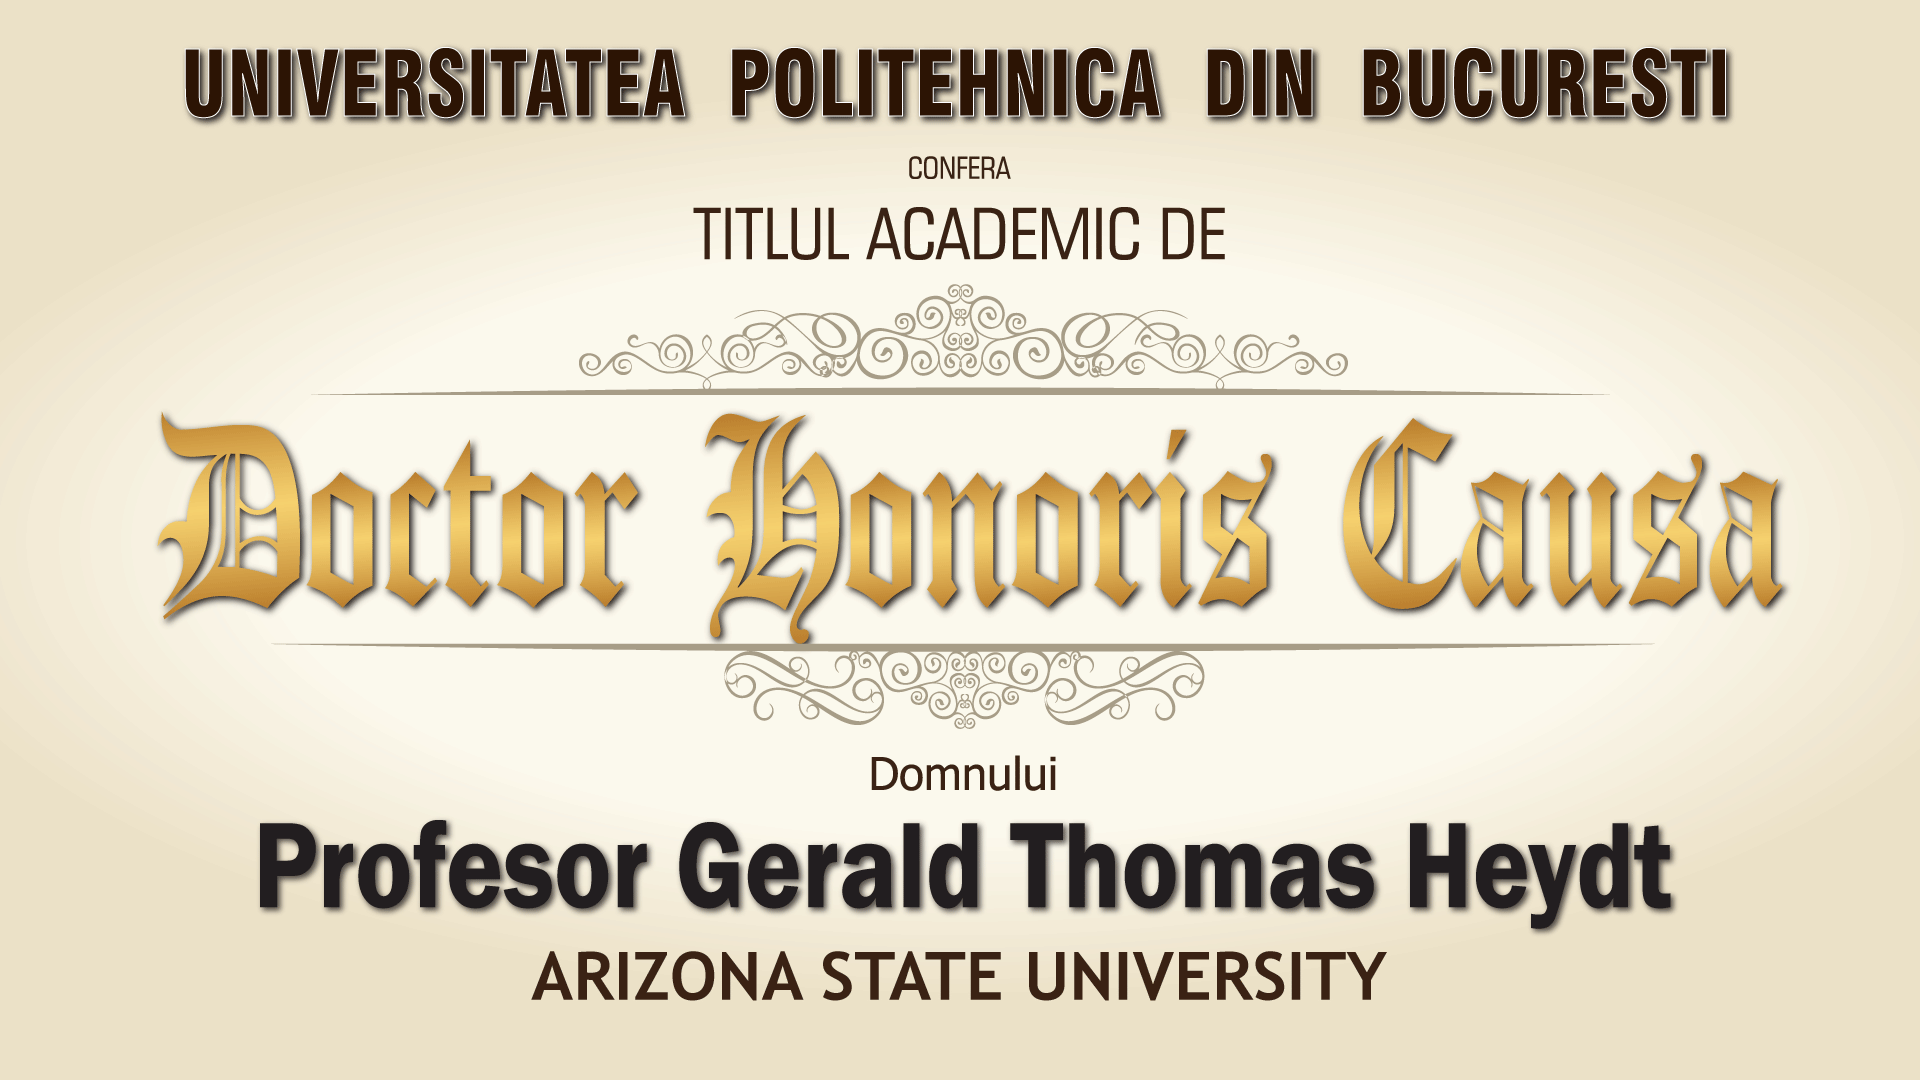 UPB a acordat astăzi titlul academic de Doctor Honoris Causa profesorului Gerald Thomas Heydt